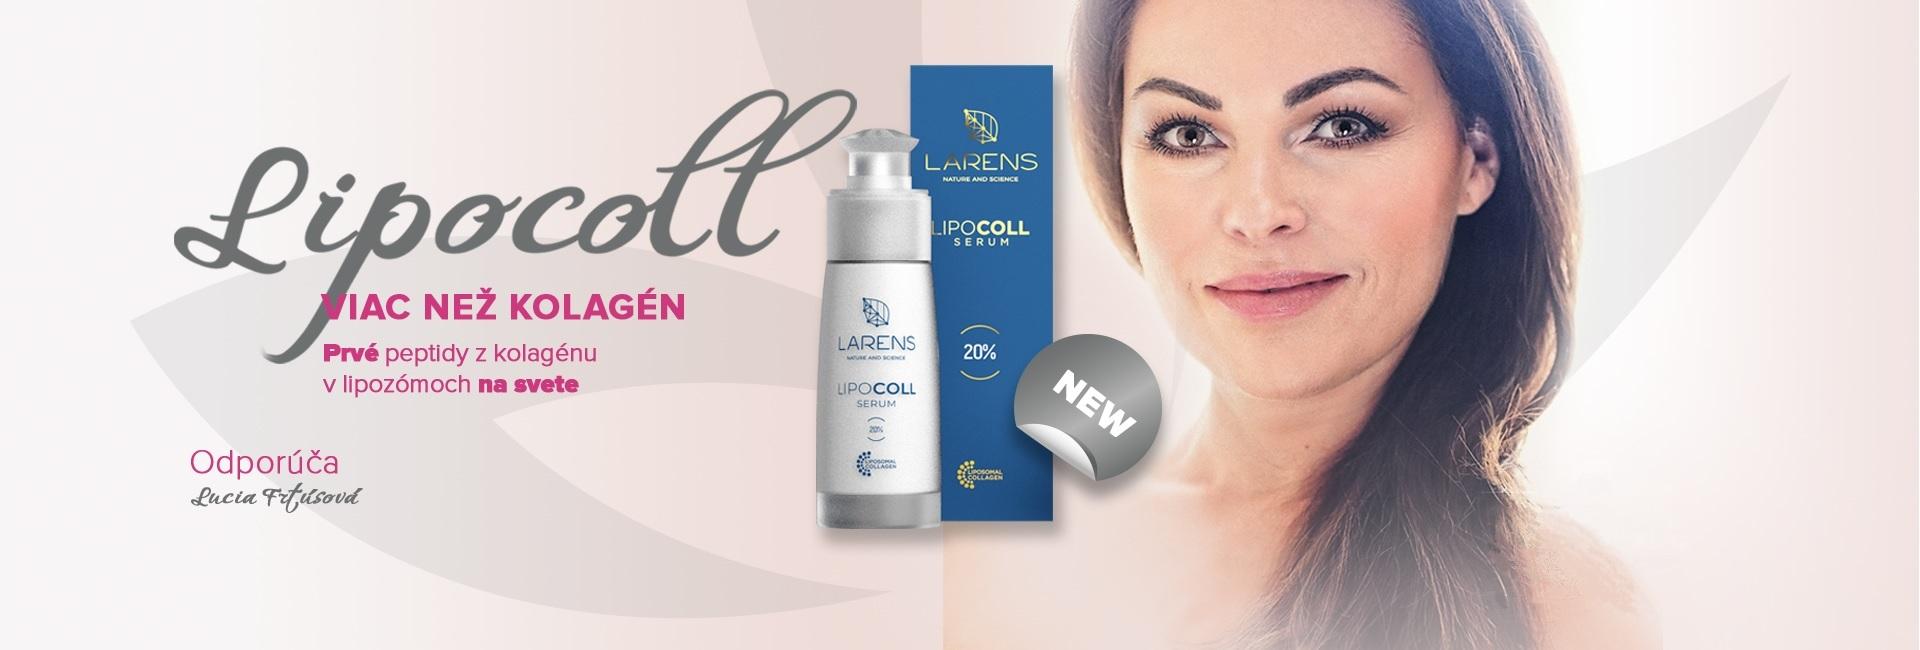 Lipocoll New